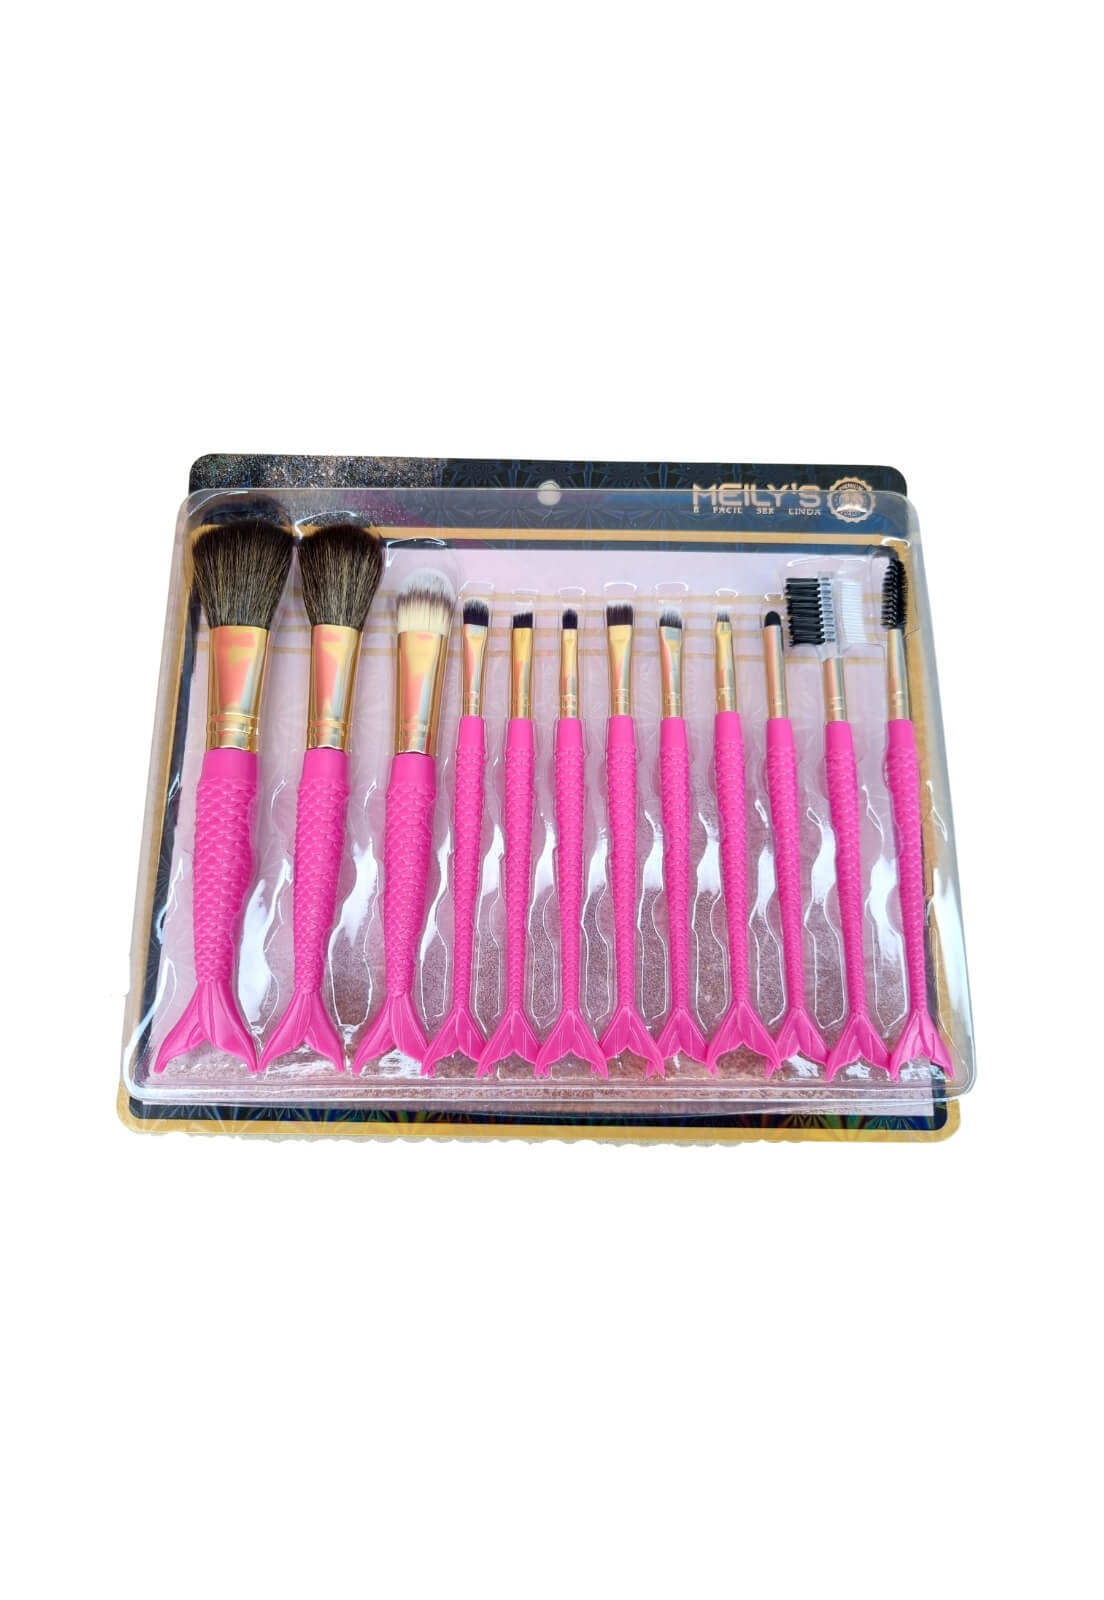 Kit com 12 pincéis cabo de sereia pink MKP-515 Meilys